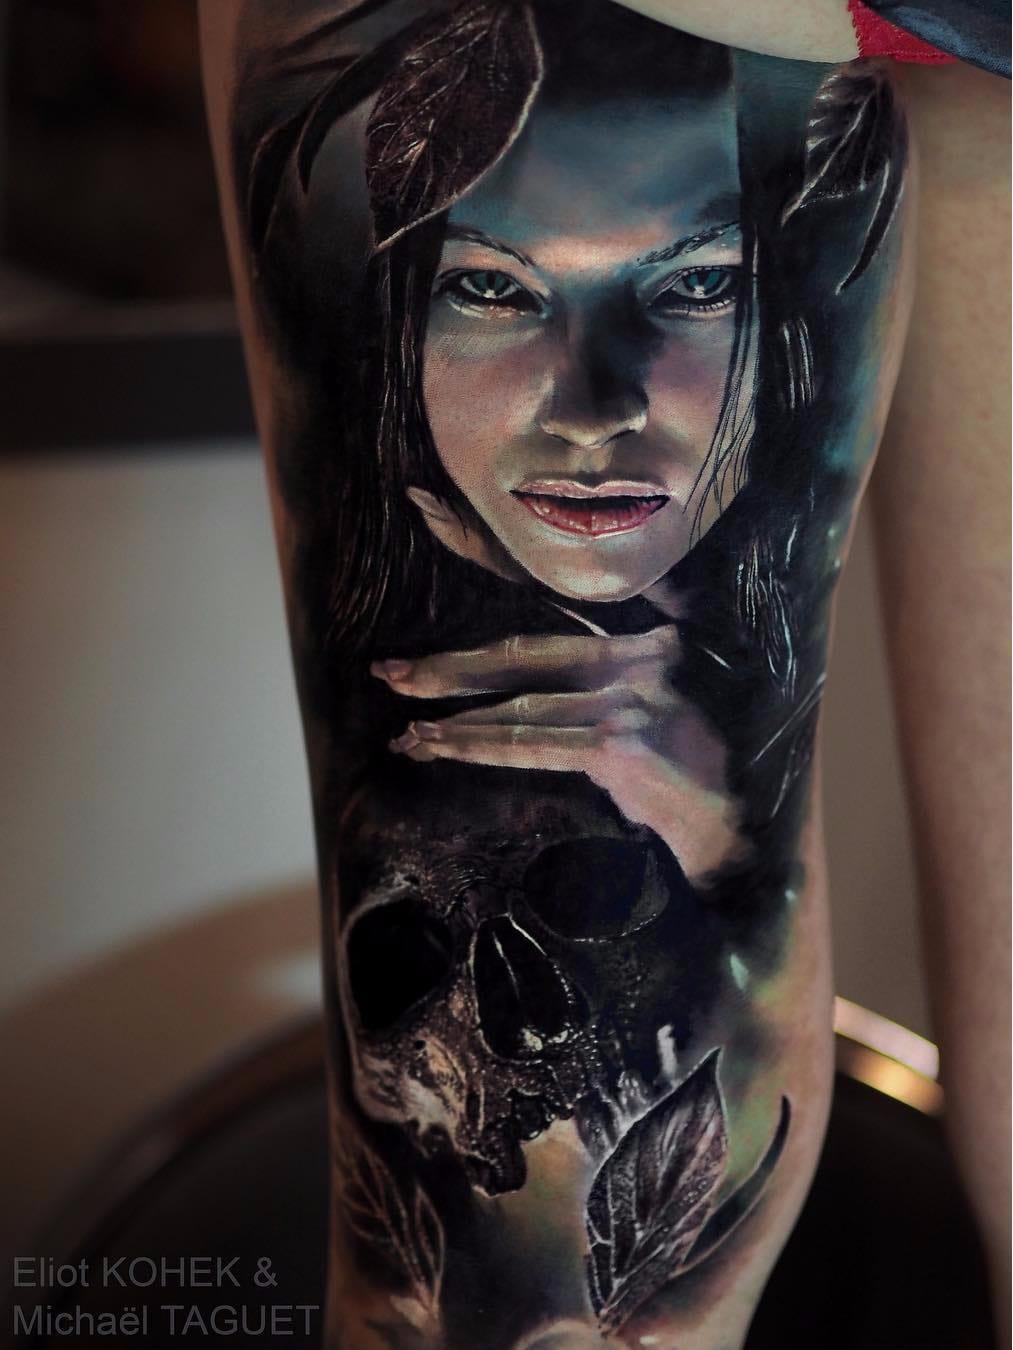 Por Eliot Kohek e Michael Taguet #EliotKohek #MichaelTaguet #gringo #realismo #realism #pretoecinza #blackandgrey #realismocolorido #skull #caveira #cranio #woman #mulher #dark #terror #horror #folha #leaf